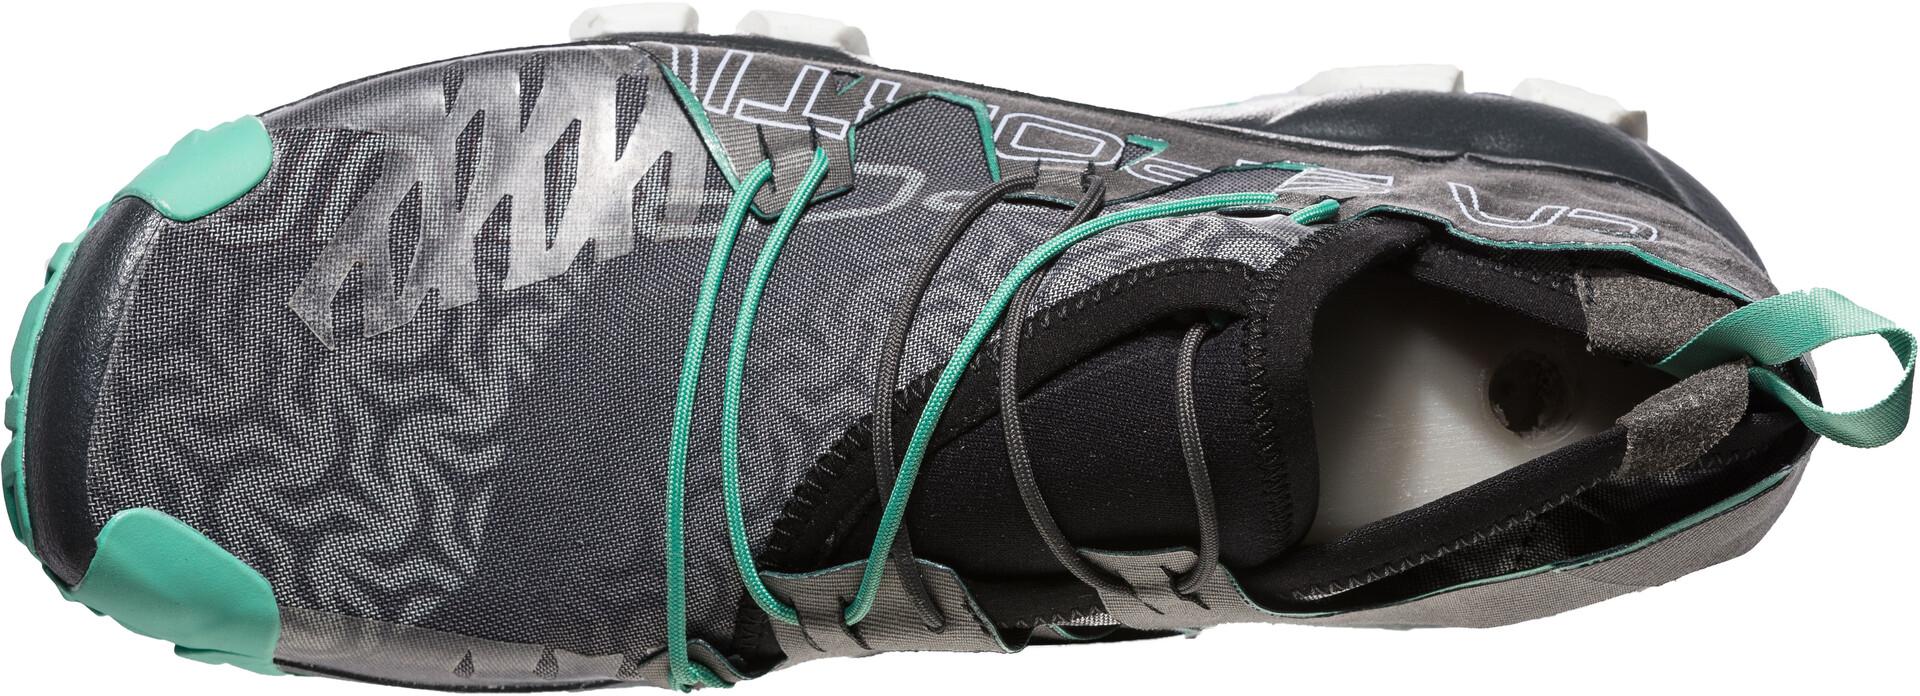 La Sportiva Unika Chaussures de trail Femme, carbonjade green